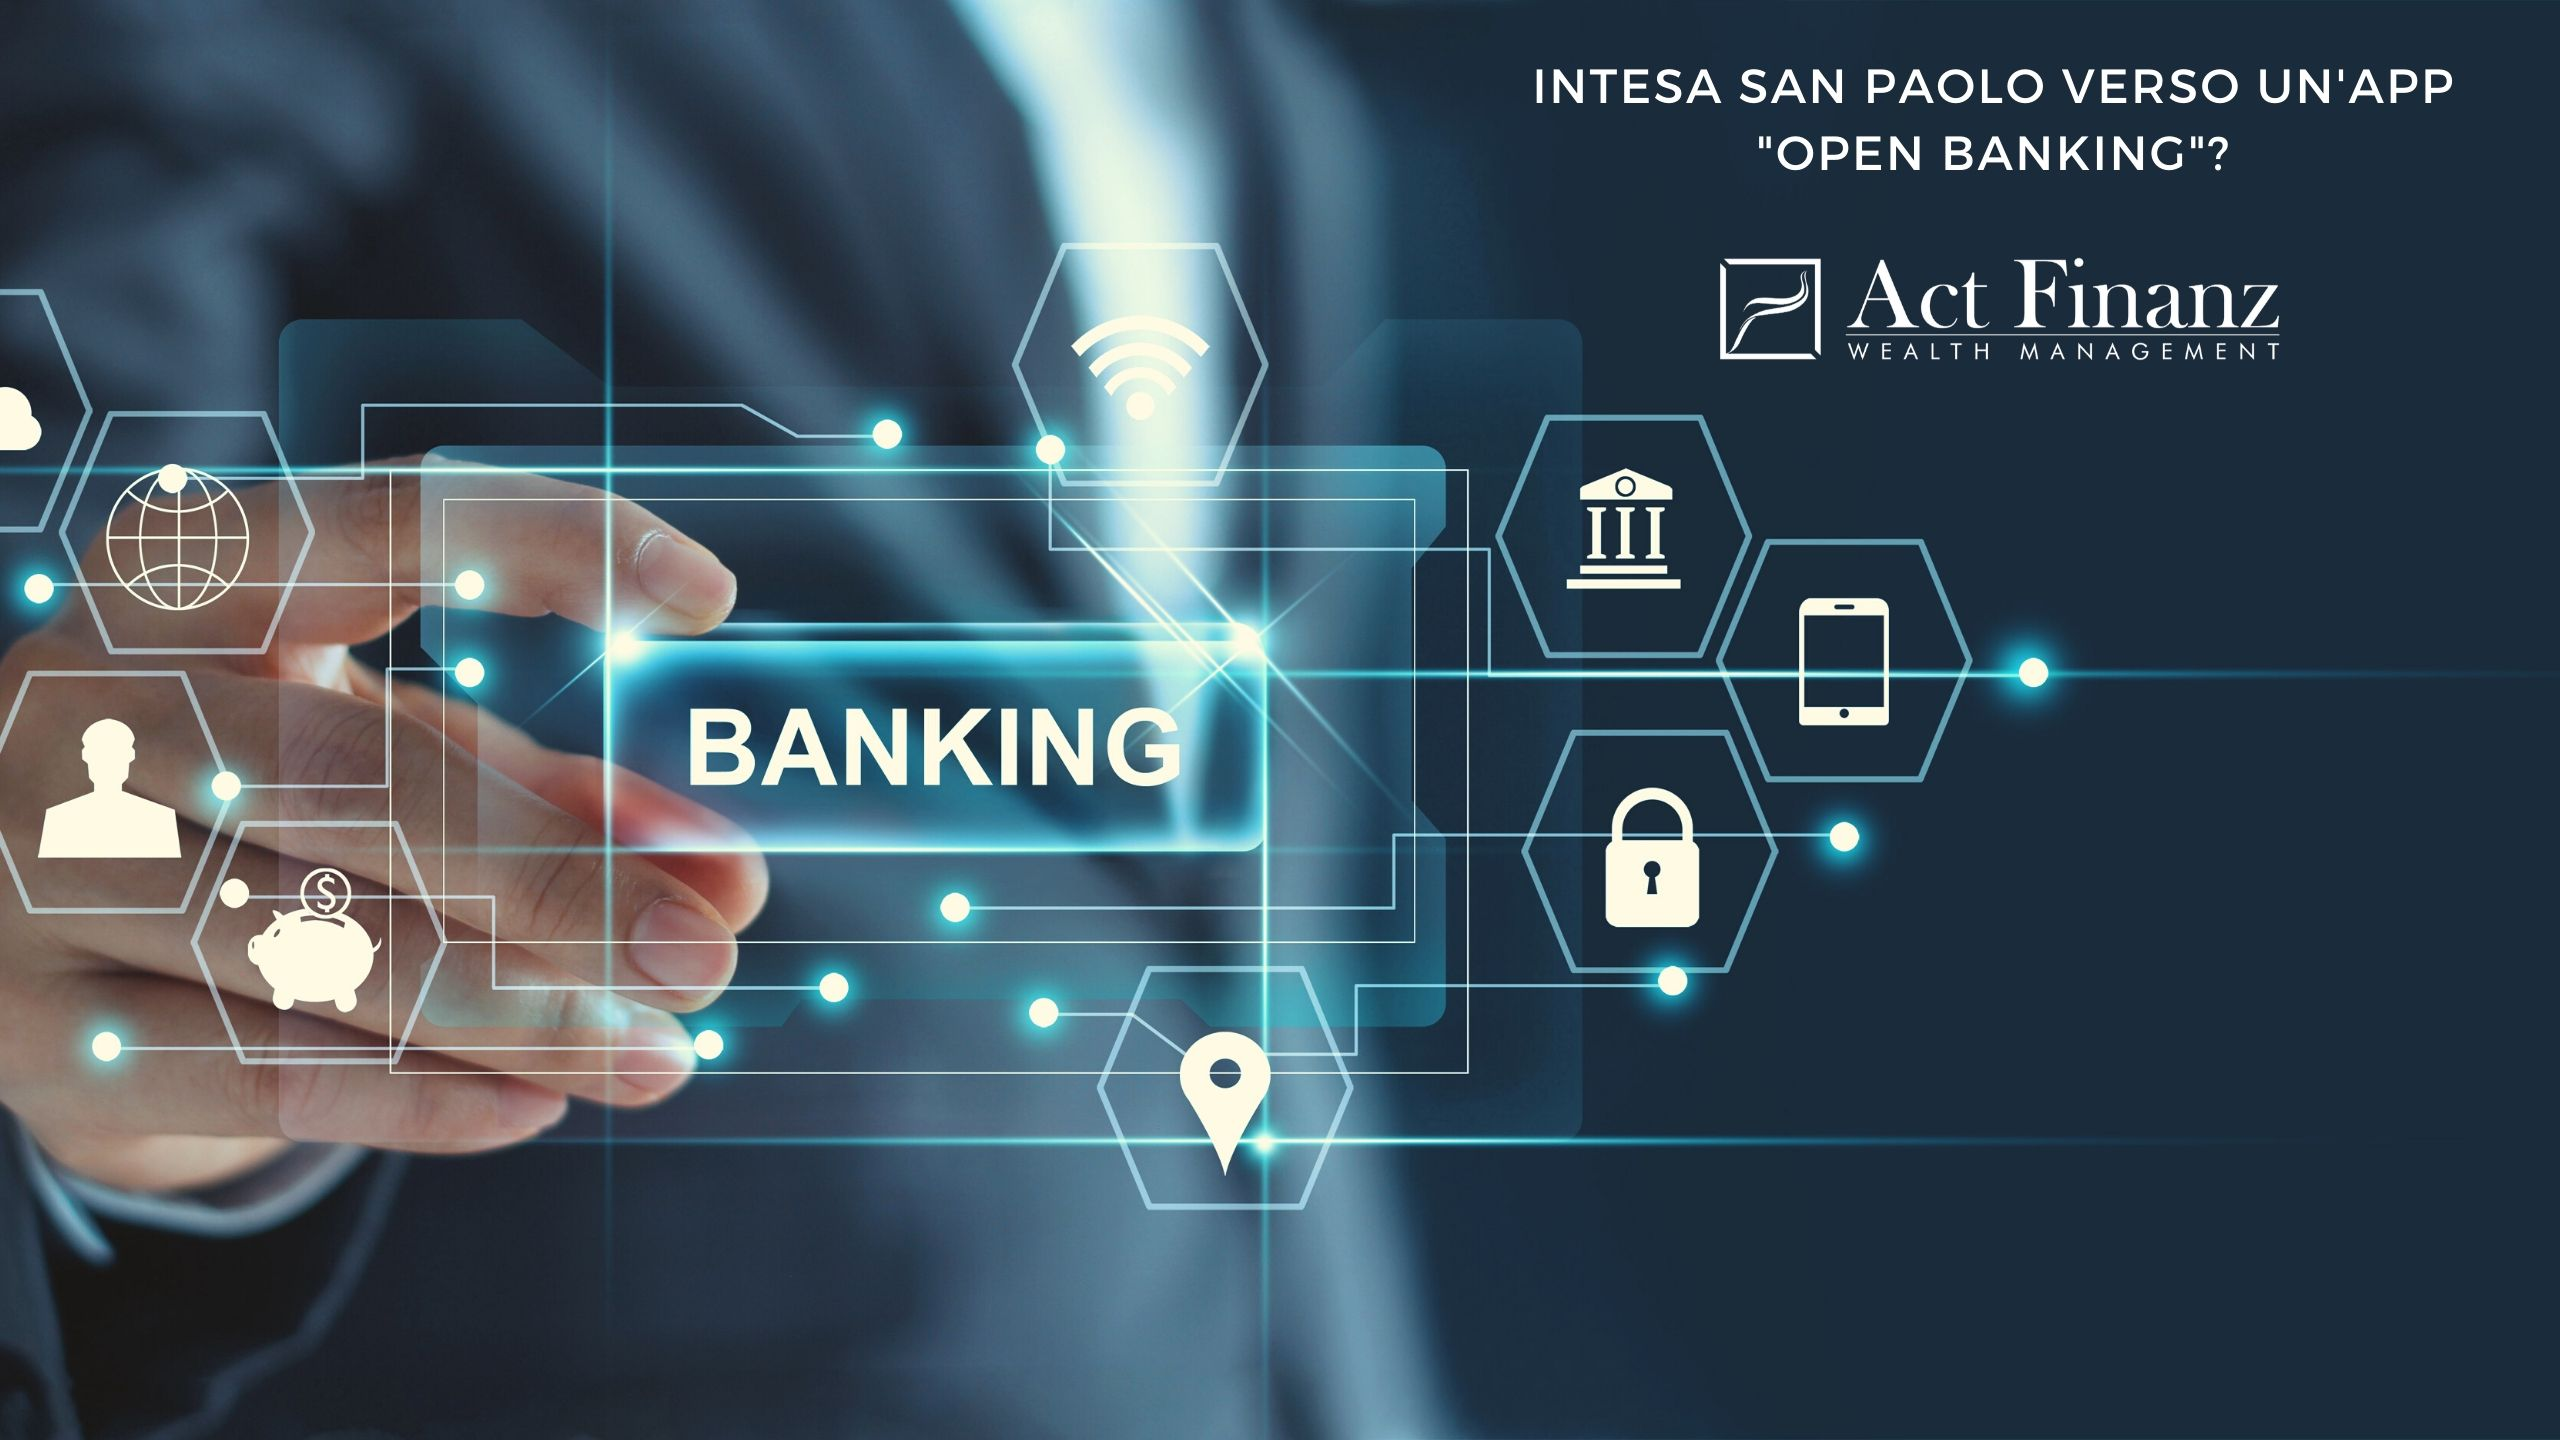 wealth management lugano, wealth management svizzera - Gestori patrimoniali svizzera - Fabio Gallo Act Finanz - GianLuca De Risi Act Finanz(9)